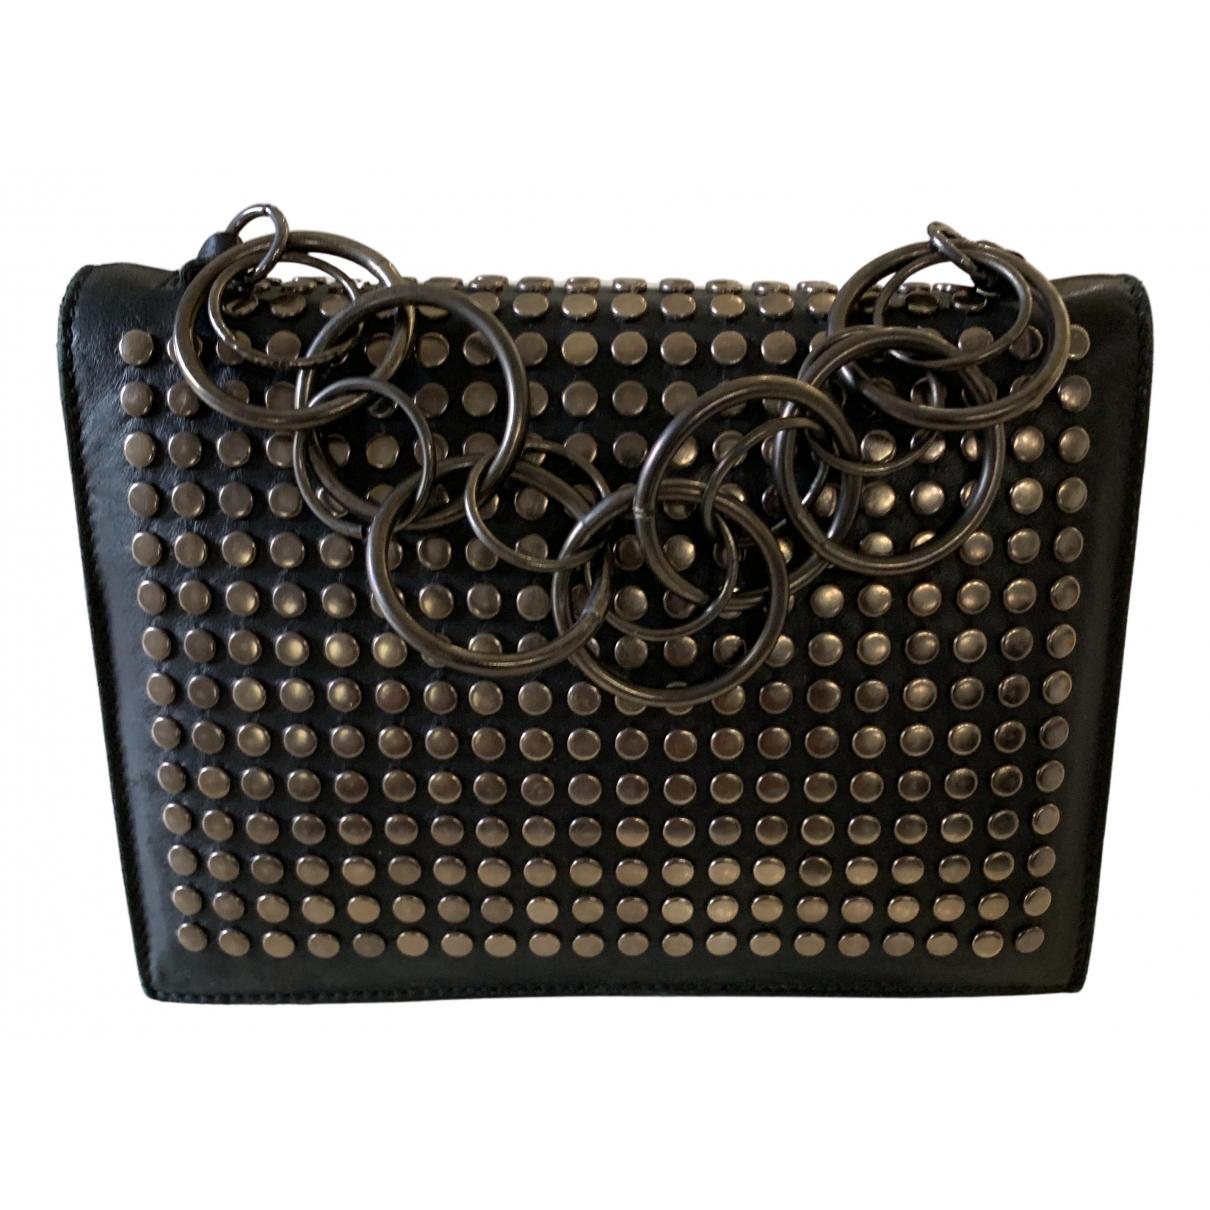 Roberto Cavalli N Black Leather handbag for Women N